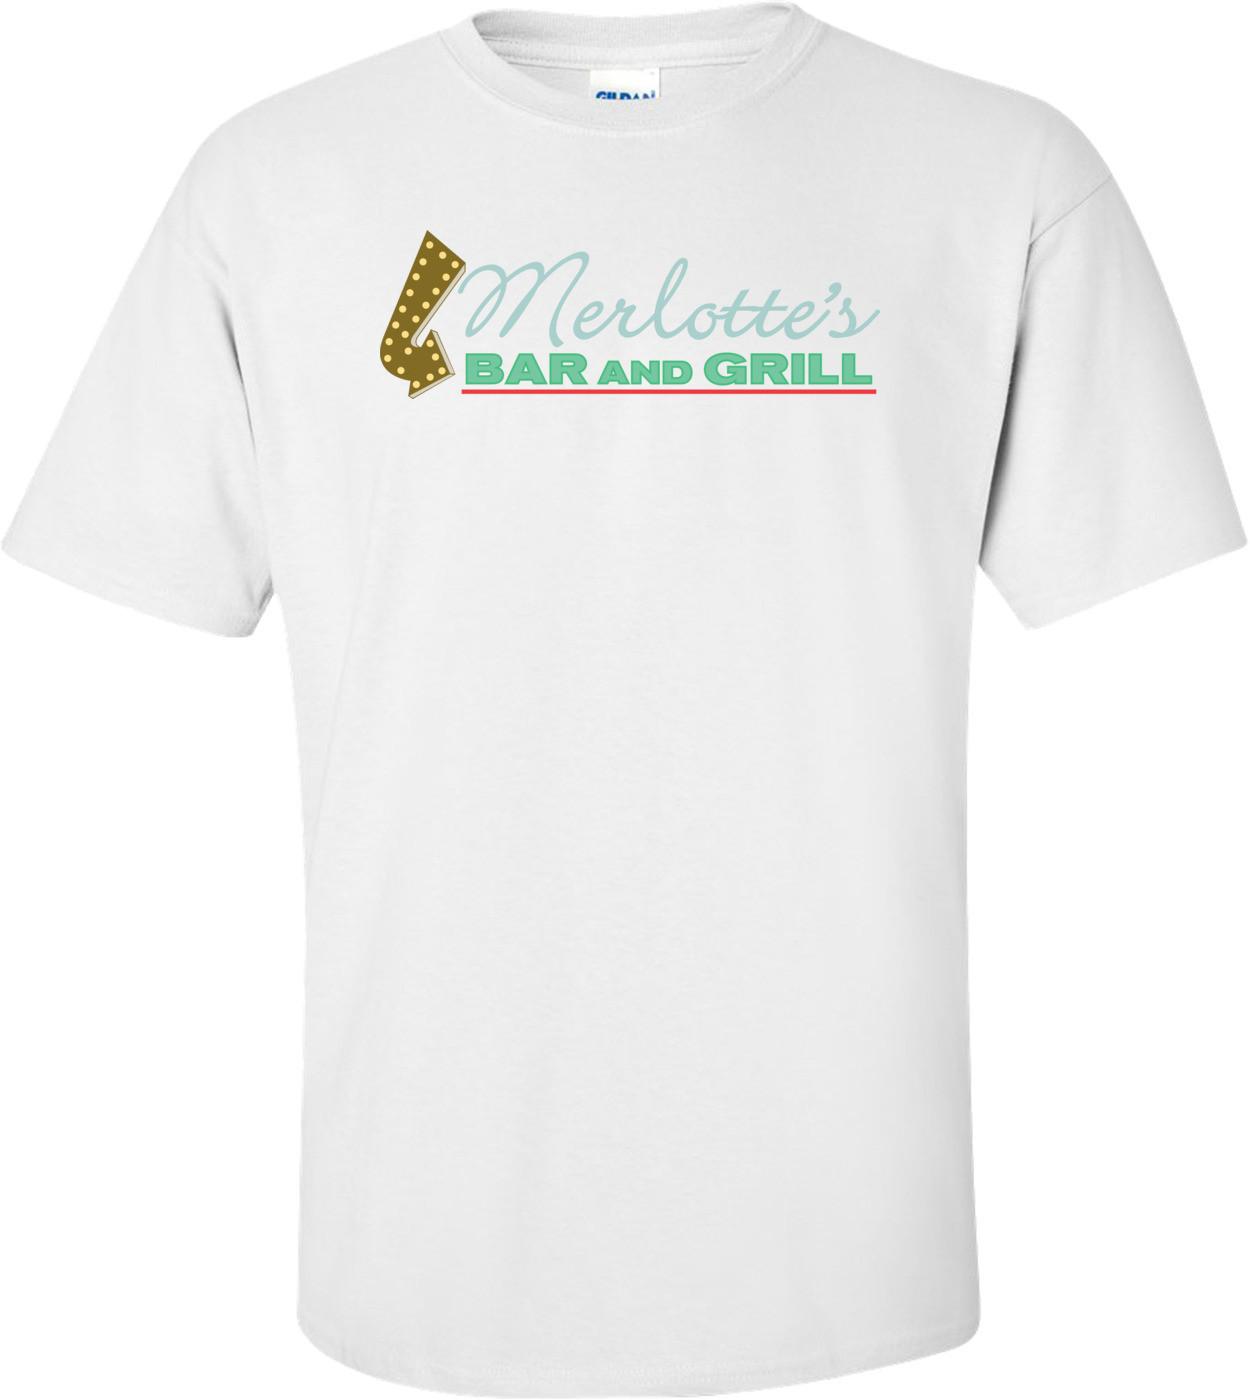 Merlotte's Bar And Grill - True Blood T-shirt